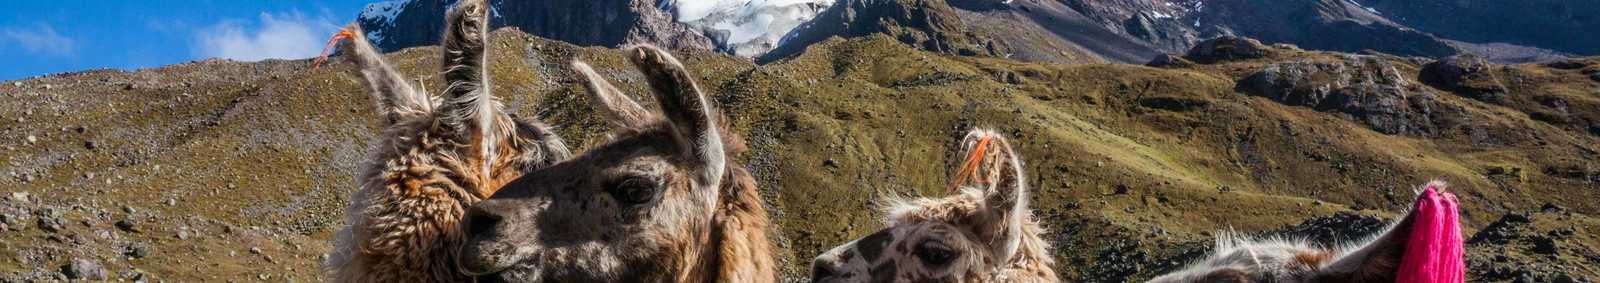 Llamas in front of mountain range